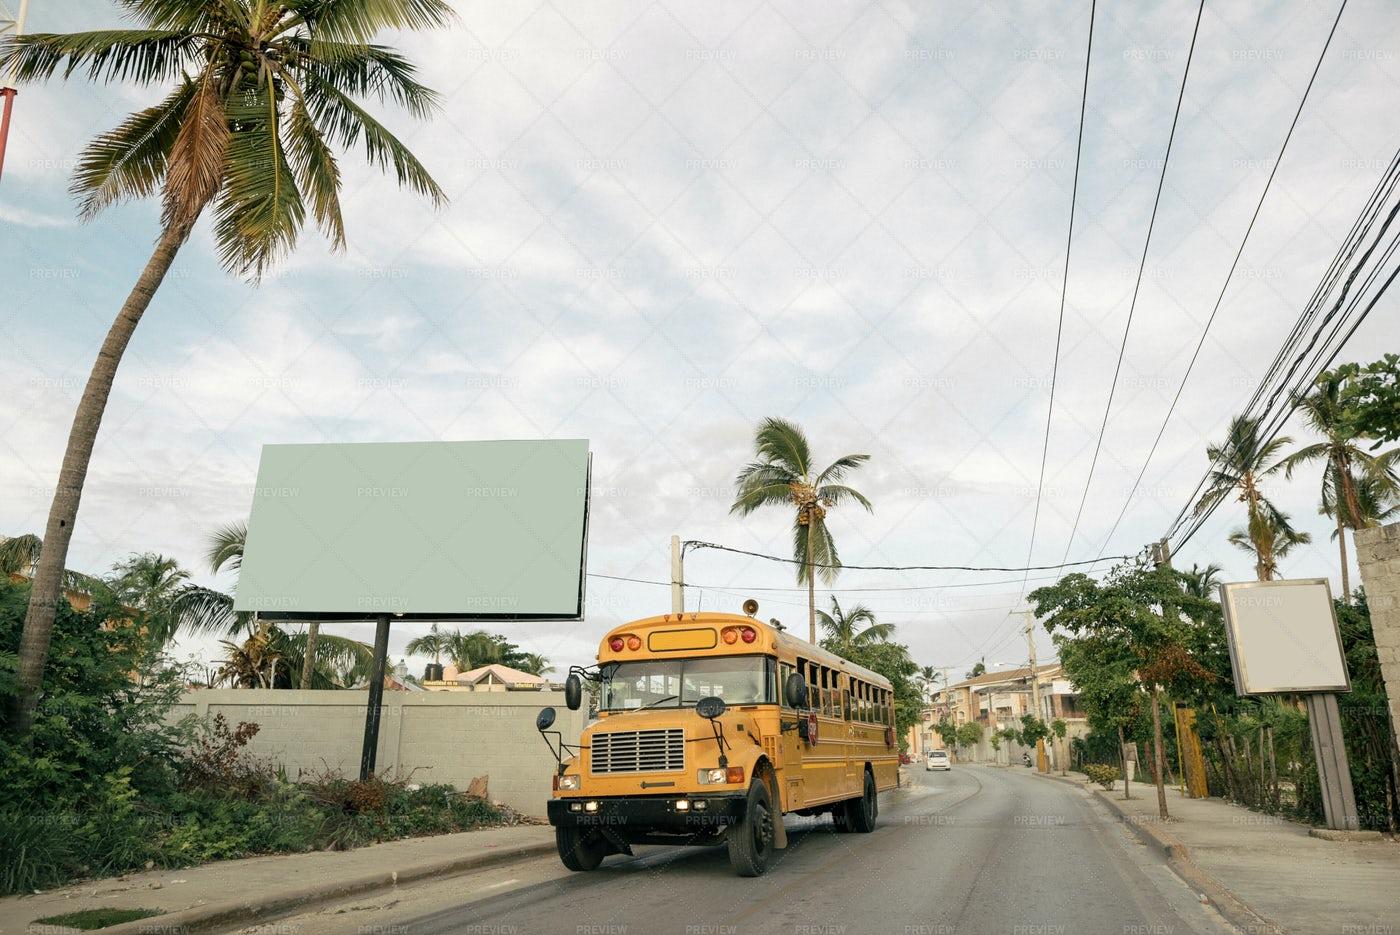 Punta Cana City Street: Stock Photos